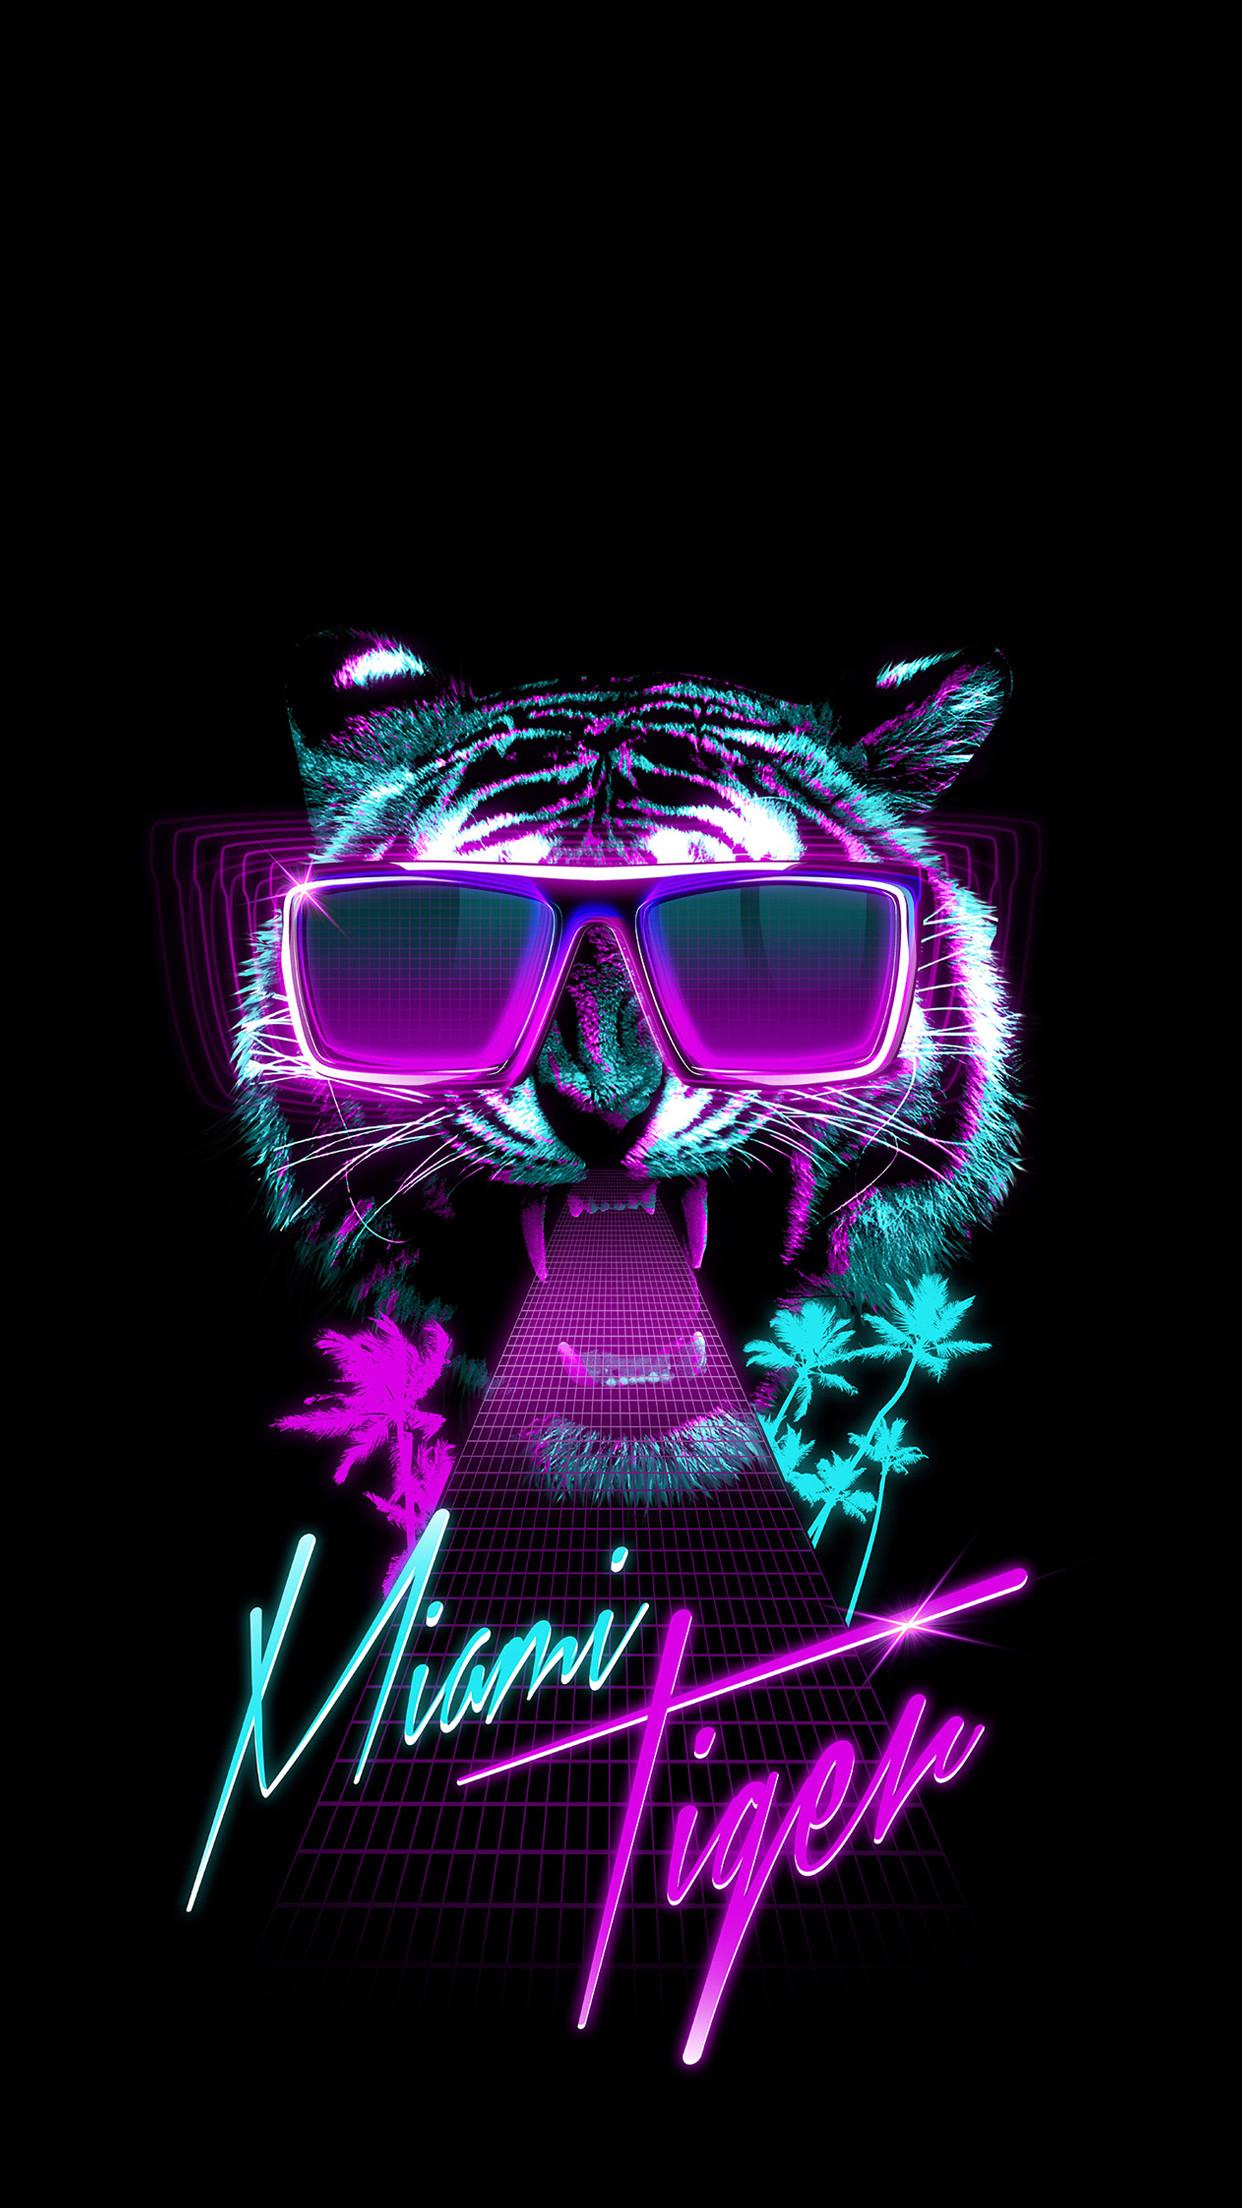 iphone 6 miami tiger night club hd wallpapers free